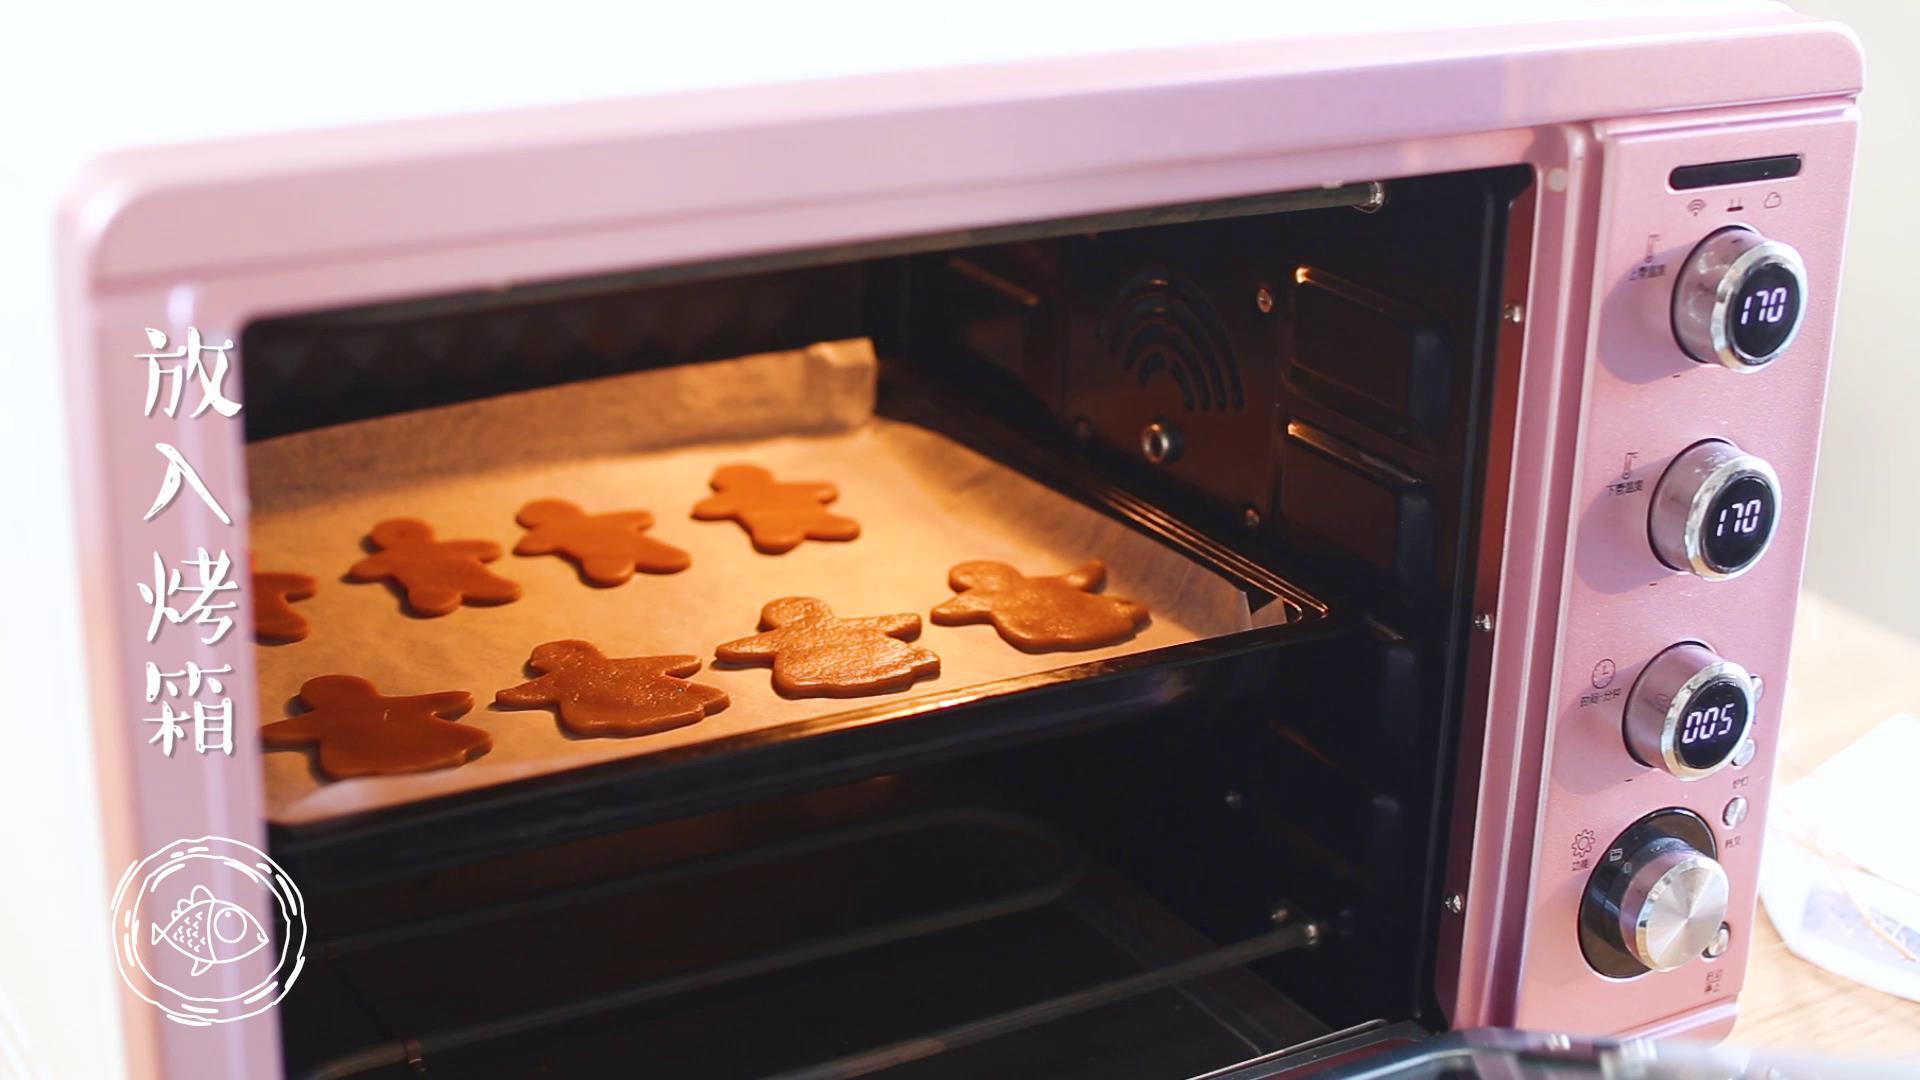 12m+姜饼人(宝宝辅食),接下来就可以放入烤箱了,上下170度烤18分钟左右~</p> <p>